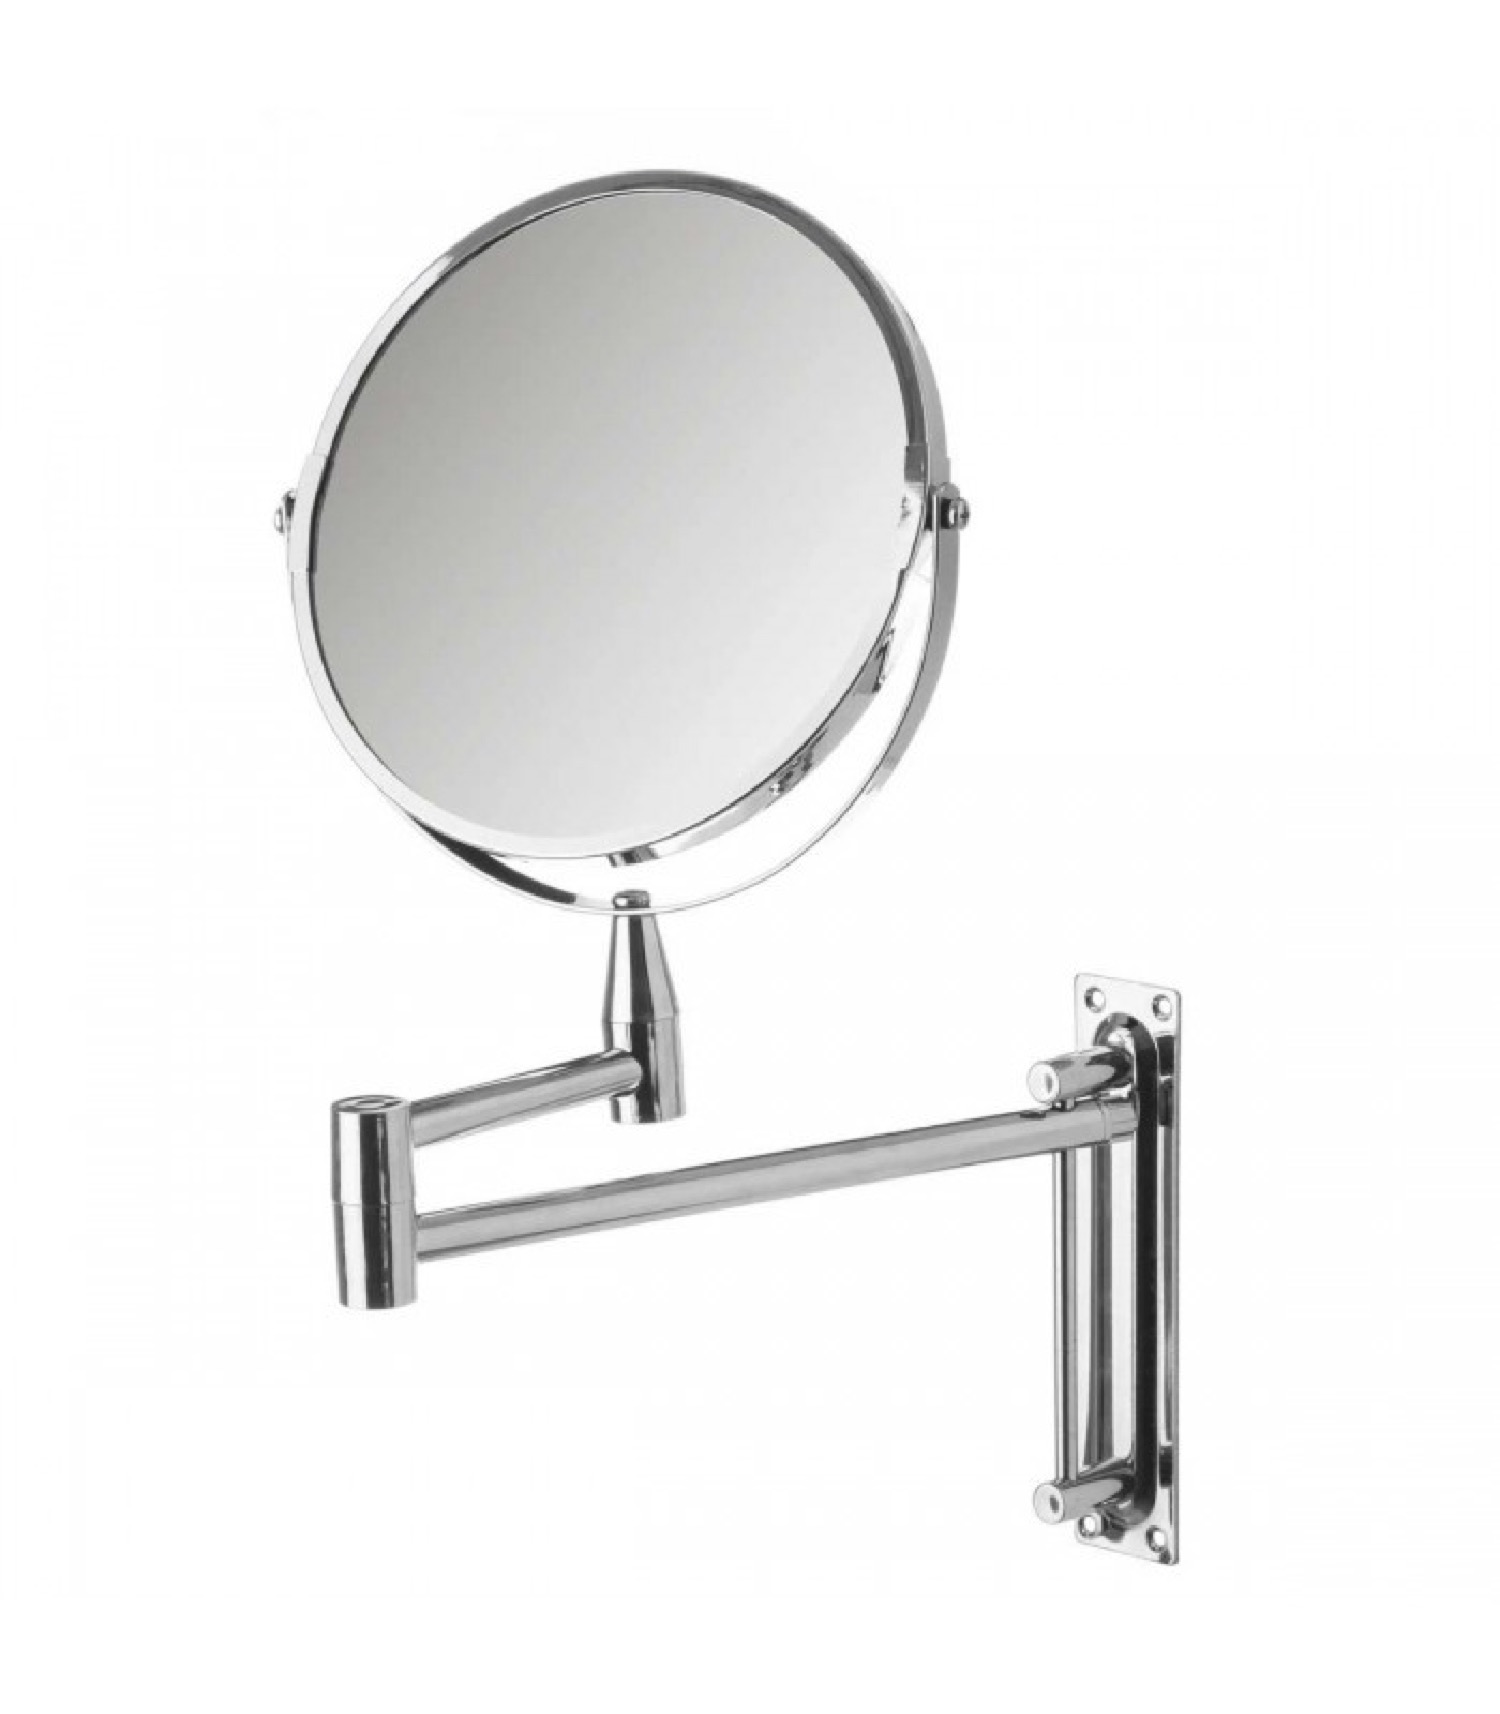 Miroir mural grossissant x2 sur bras extensible 39x3x36cm